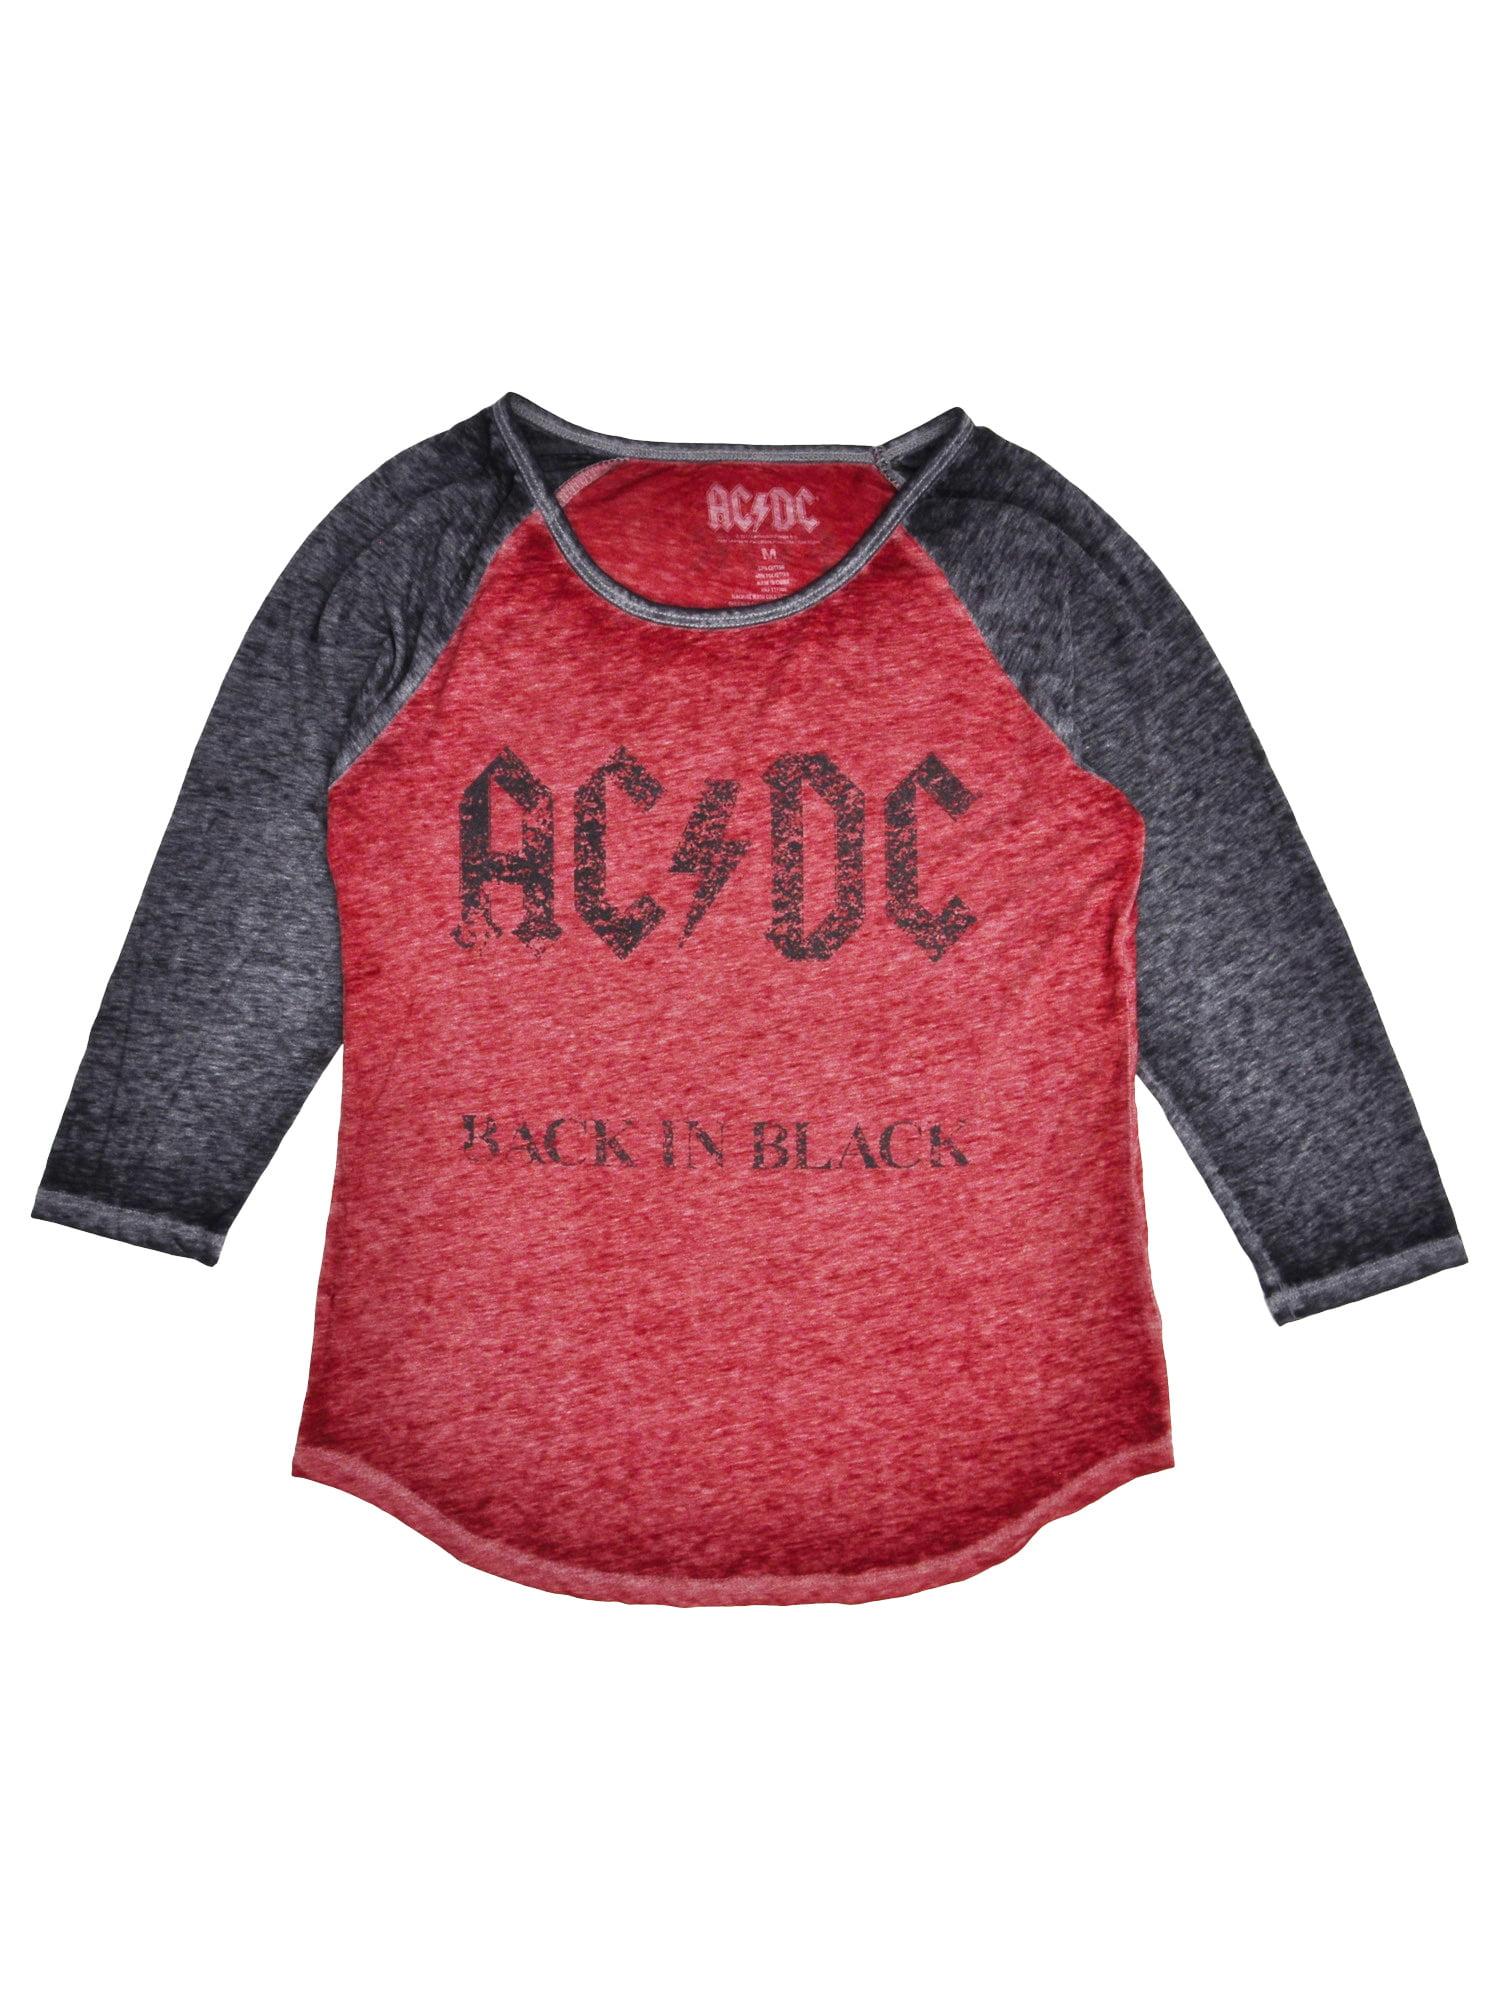 Women/'s ACDC Burnout Raglan Rock Band T-Shirt